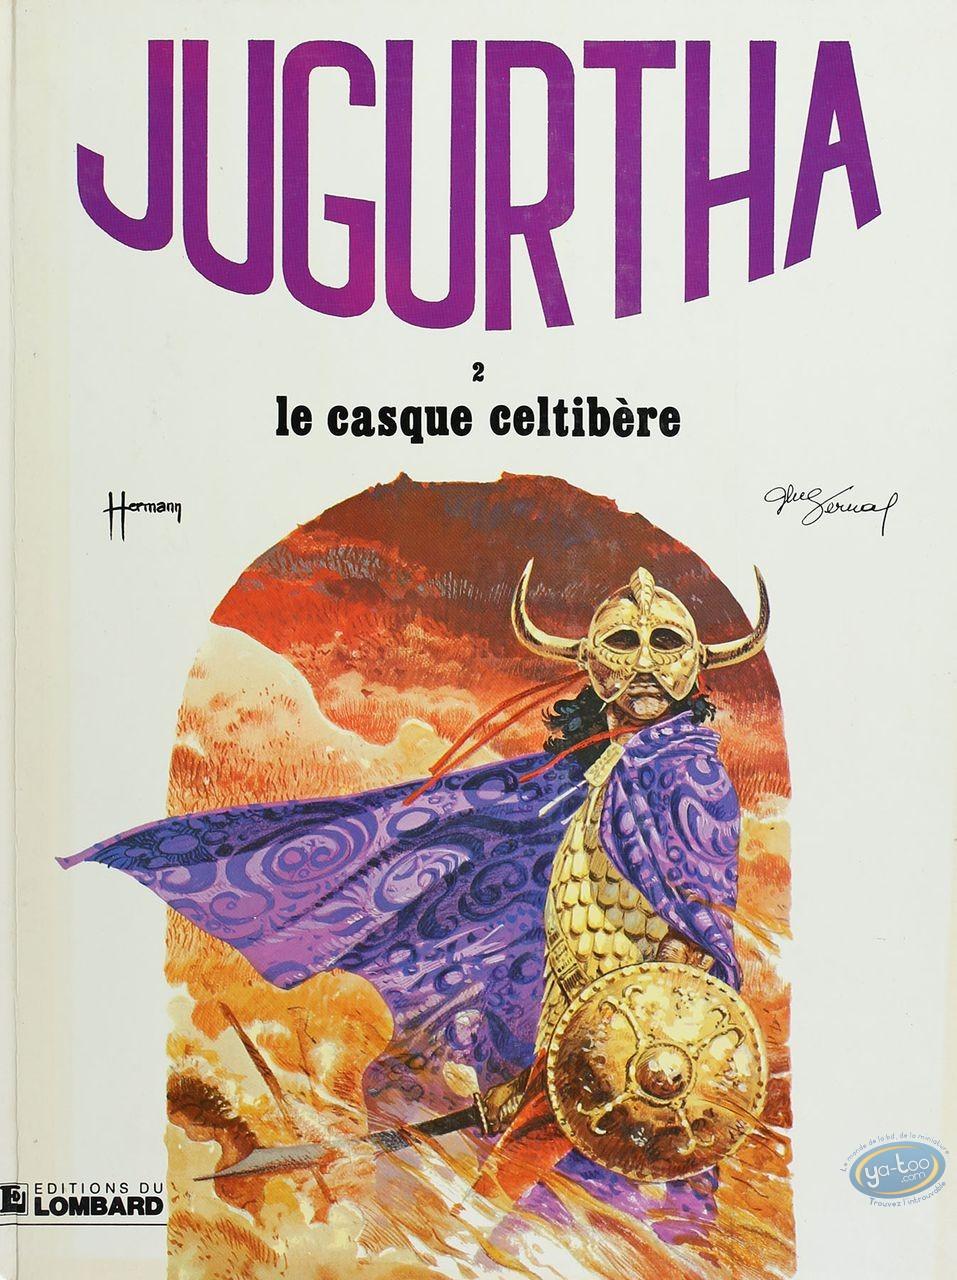 Listed European Comic Books, Jugurtha : Le casque celtibere (very good condition)